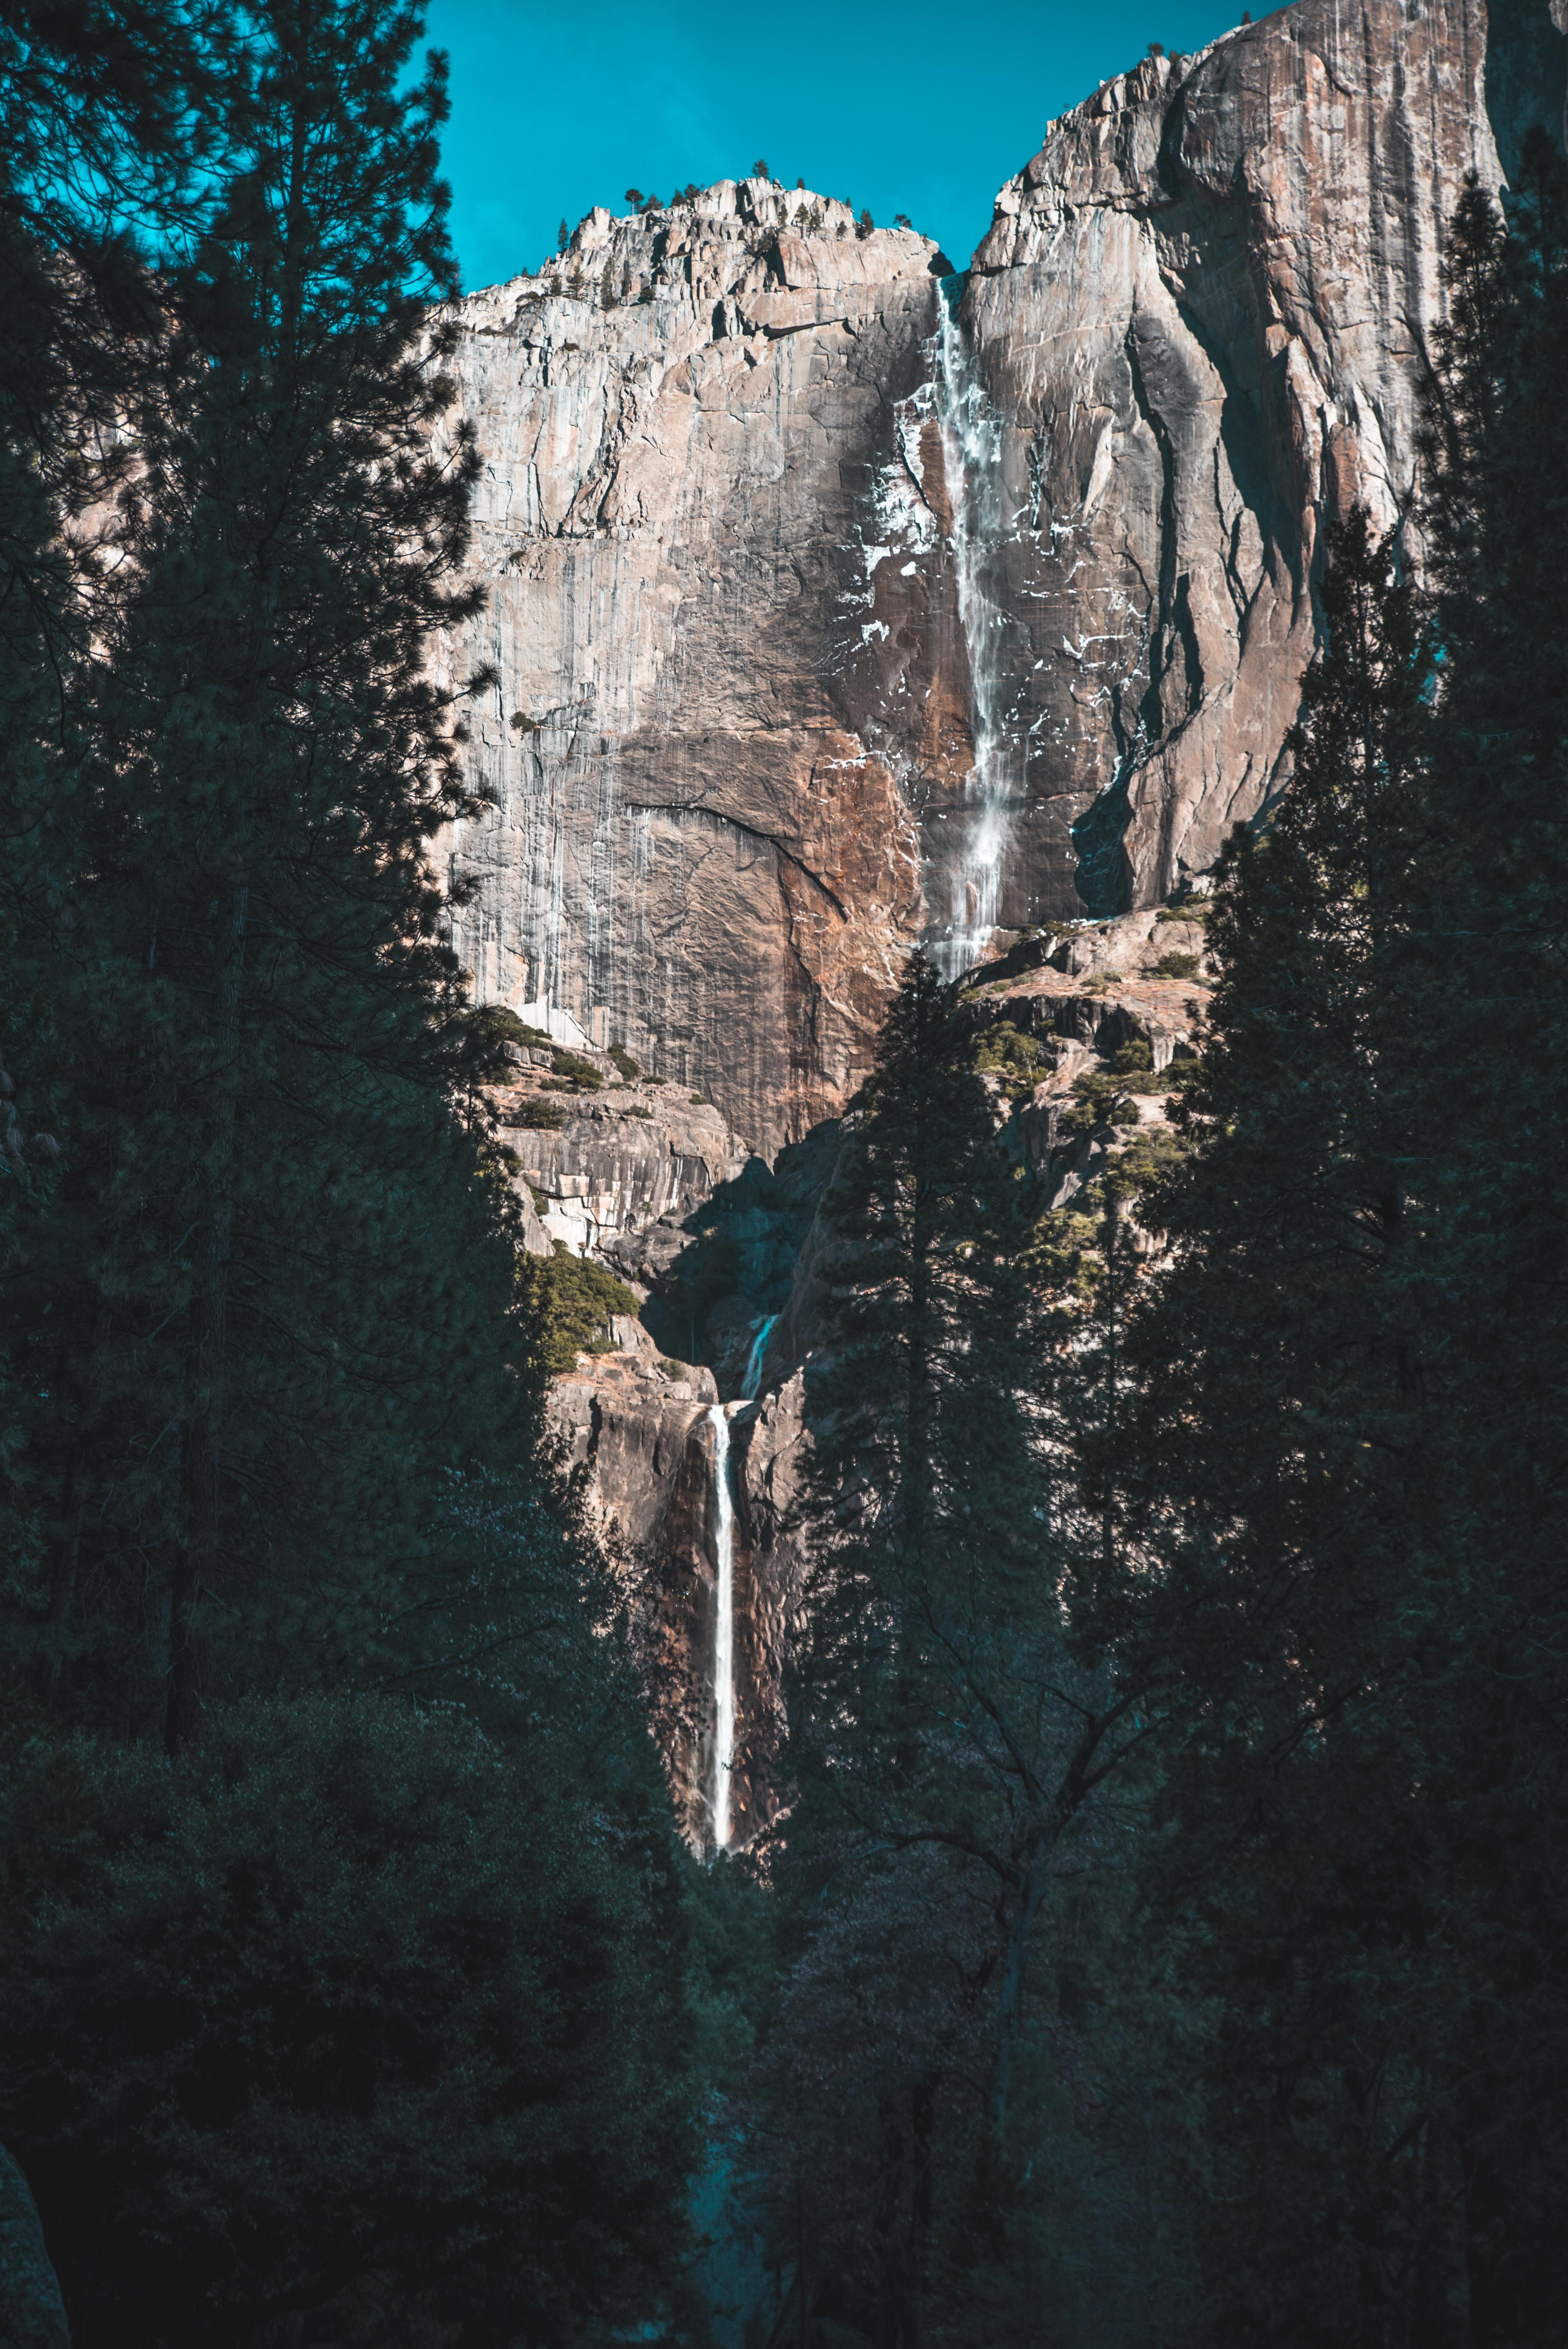 waterfalls on rock mountain